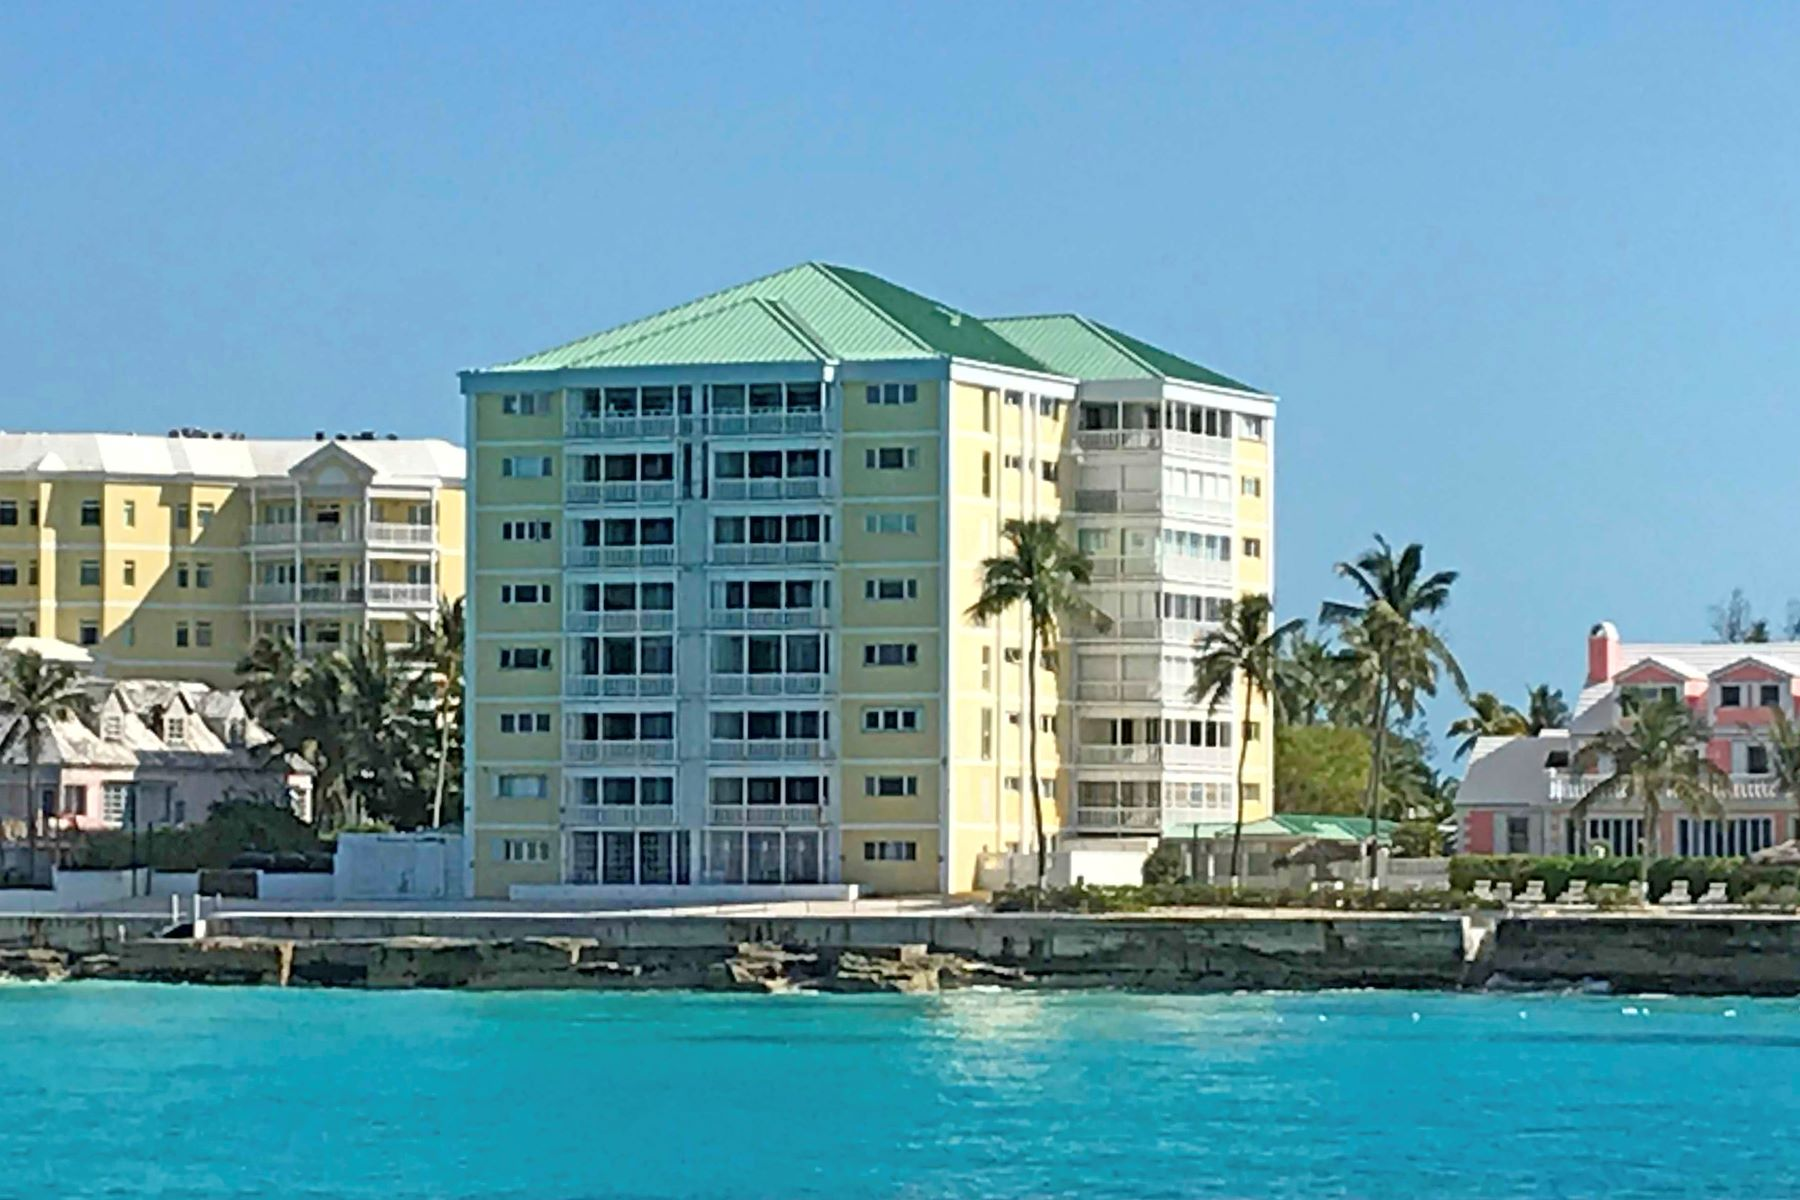 Nhà chung cư vì Bán tại Conchrest Penthouse Conchrest, Cable Beach, New Providence/Nassau Bahamas